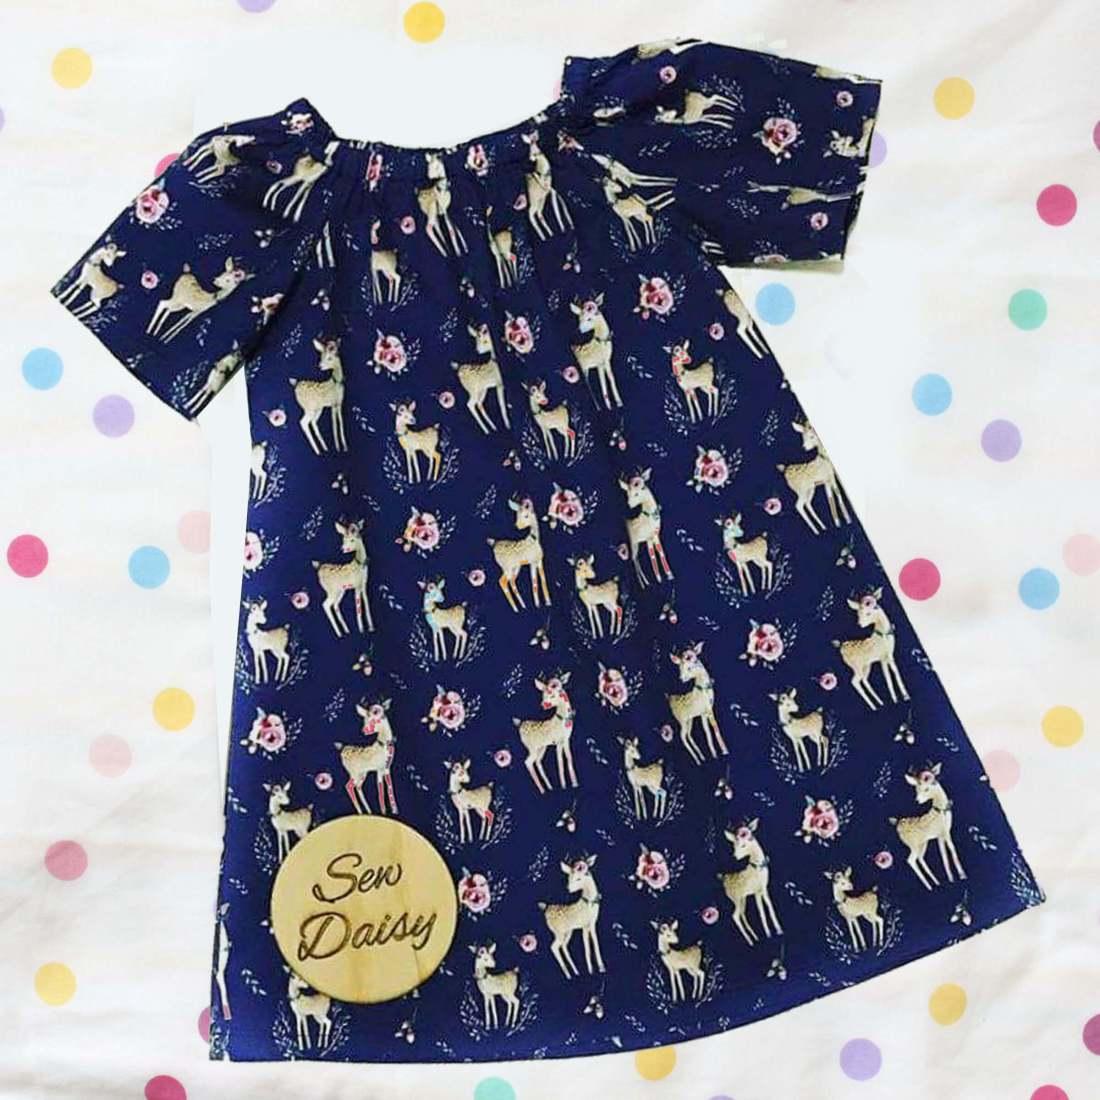 sew-daisy-handmade-girls-dress